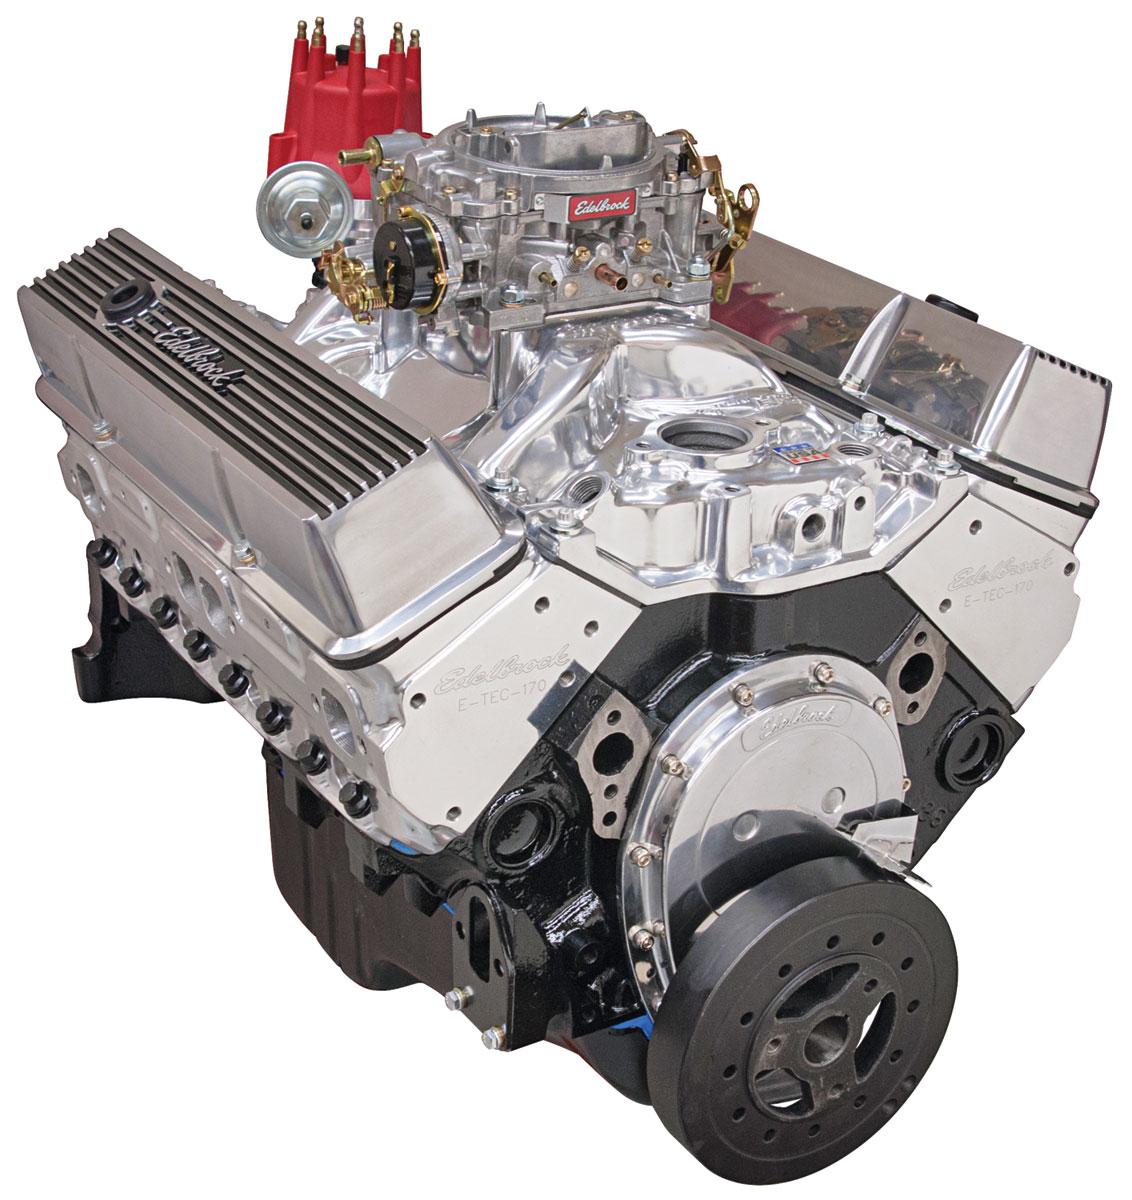 Photo of Crate Engine, Performer Hi-Torq, Edelbrock W/O Water Pump polished